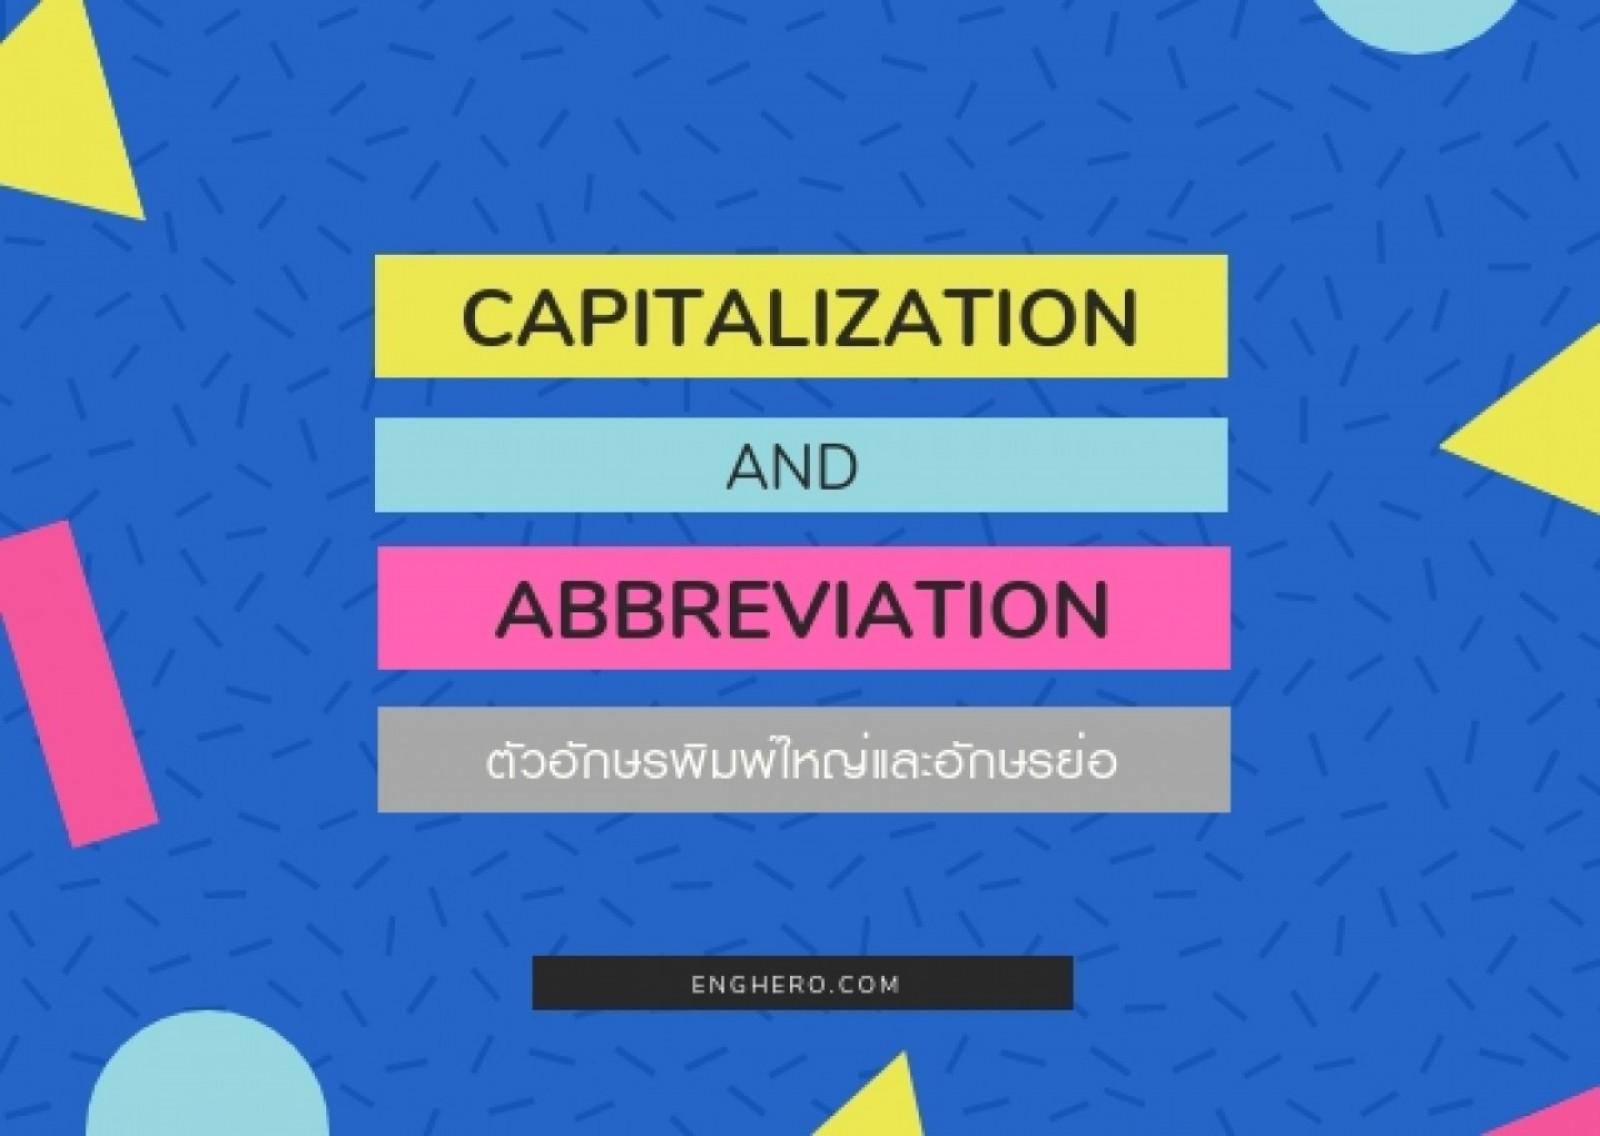 Capitalization and Abbreviations ตัวอักษรพิมพ์ใหญ่และอักษรย่อ